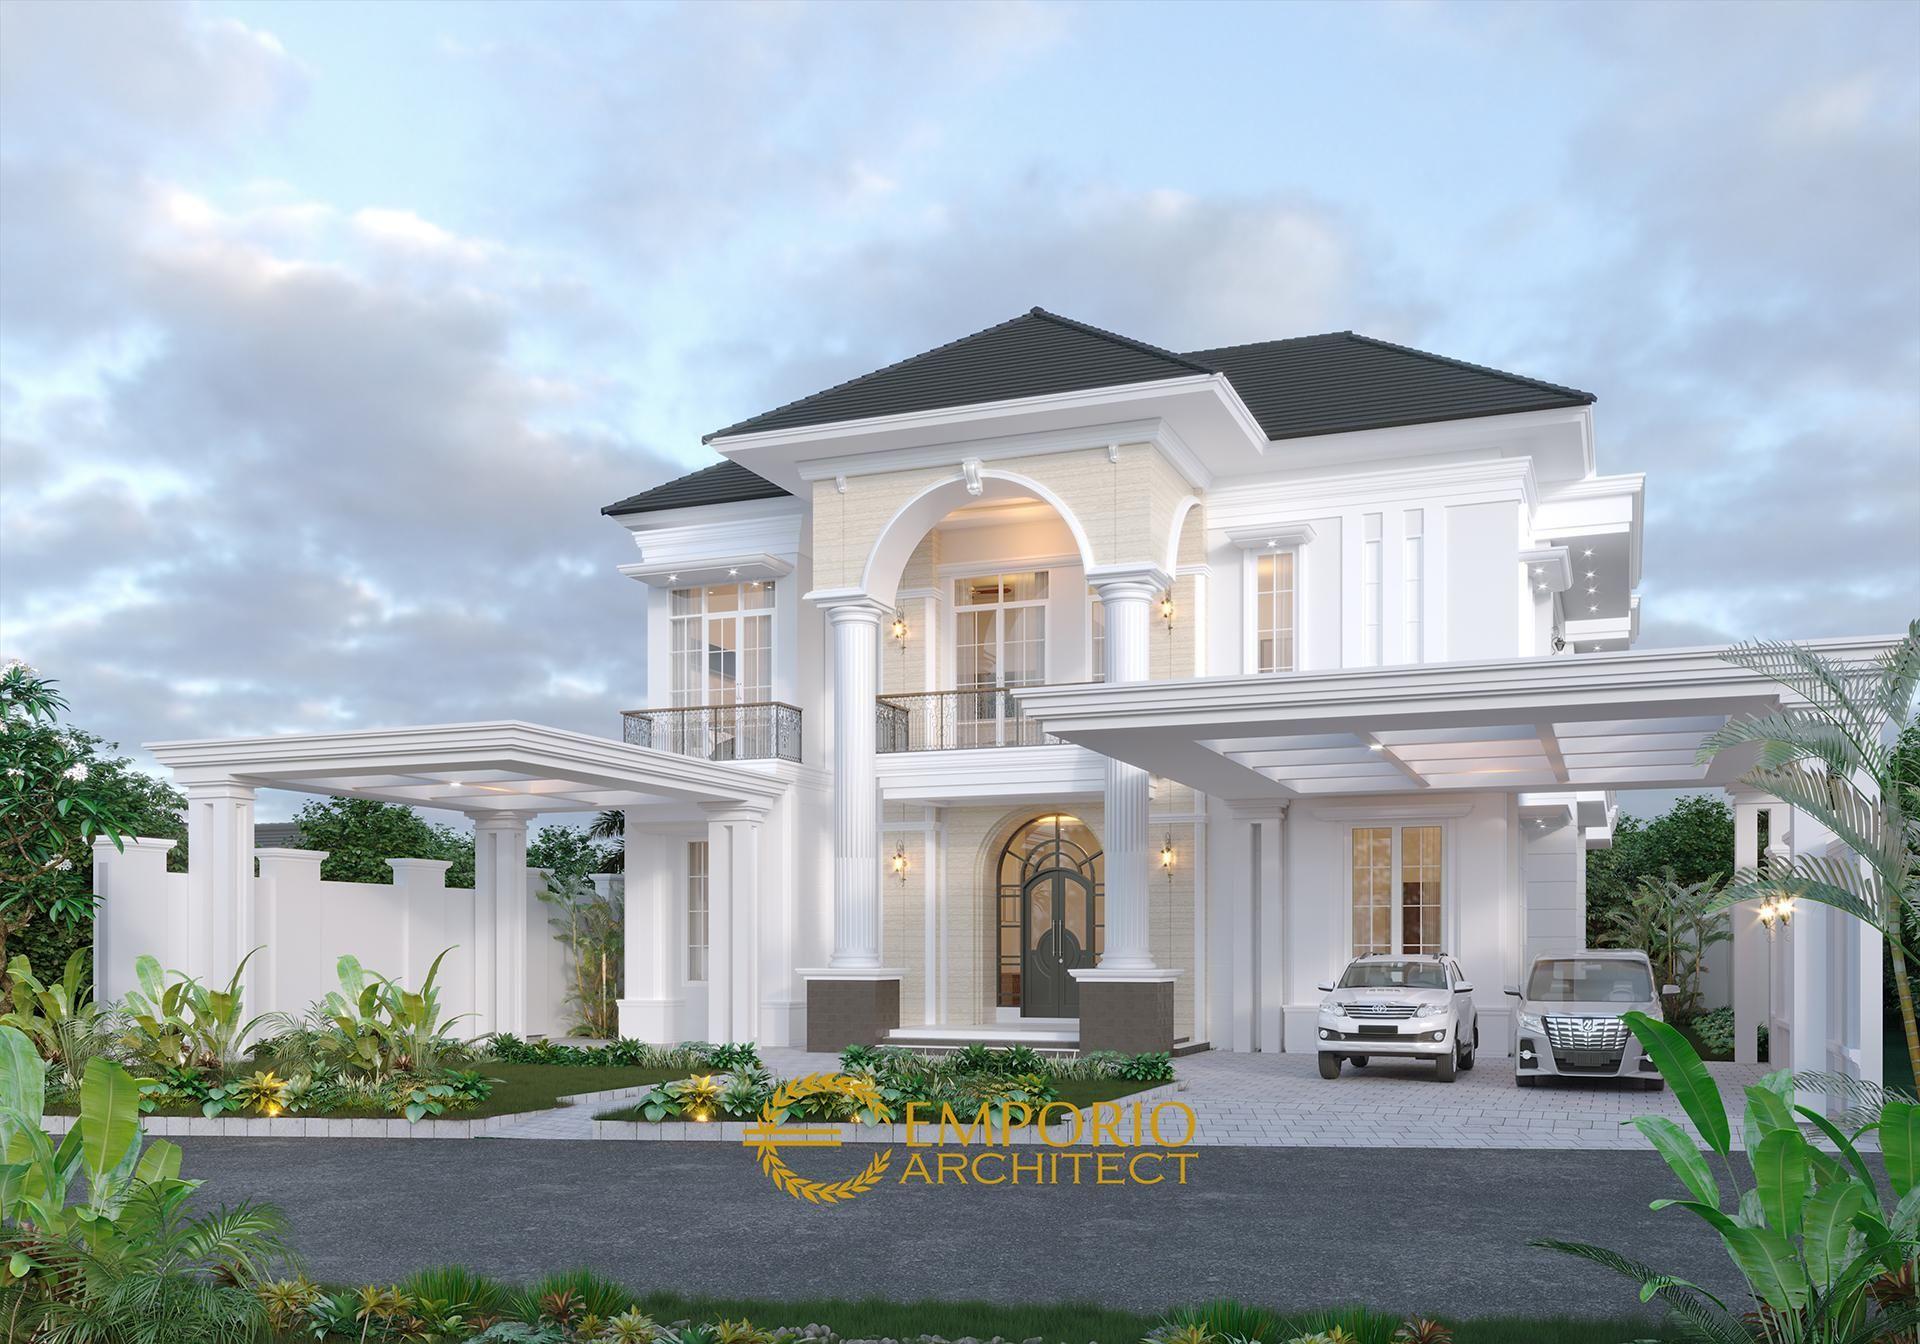 Desain Rumah Mediteran 2 Lantai Bapak Datuk Sabri Di Malaysia Desain Rumah Rumah Mewah Rumah